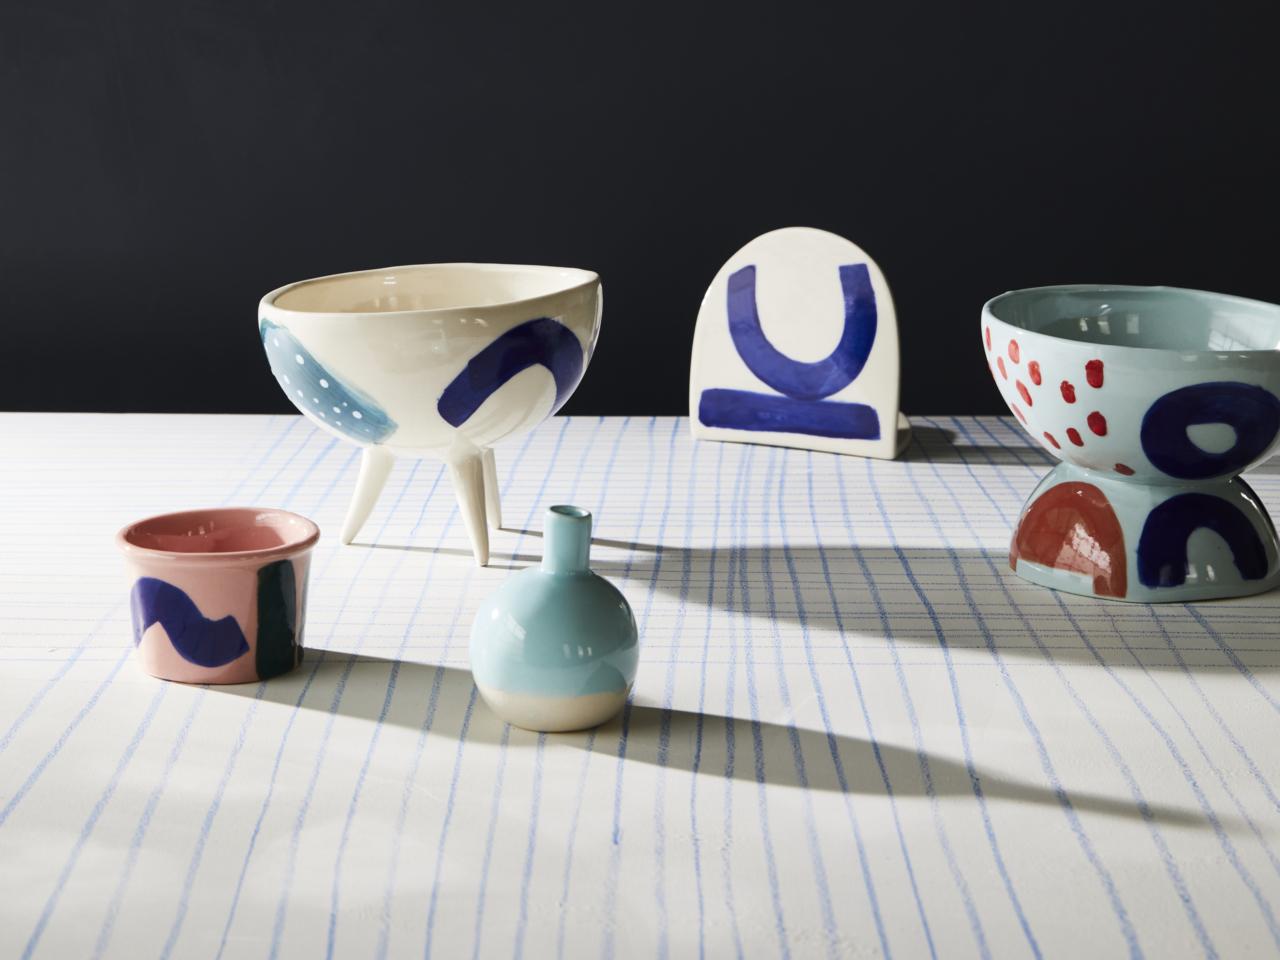 Kaz-morton-various-bowls-1280x960.jpg